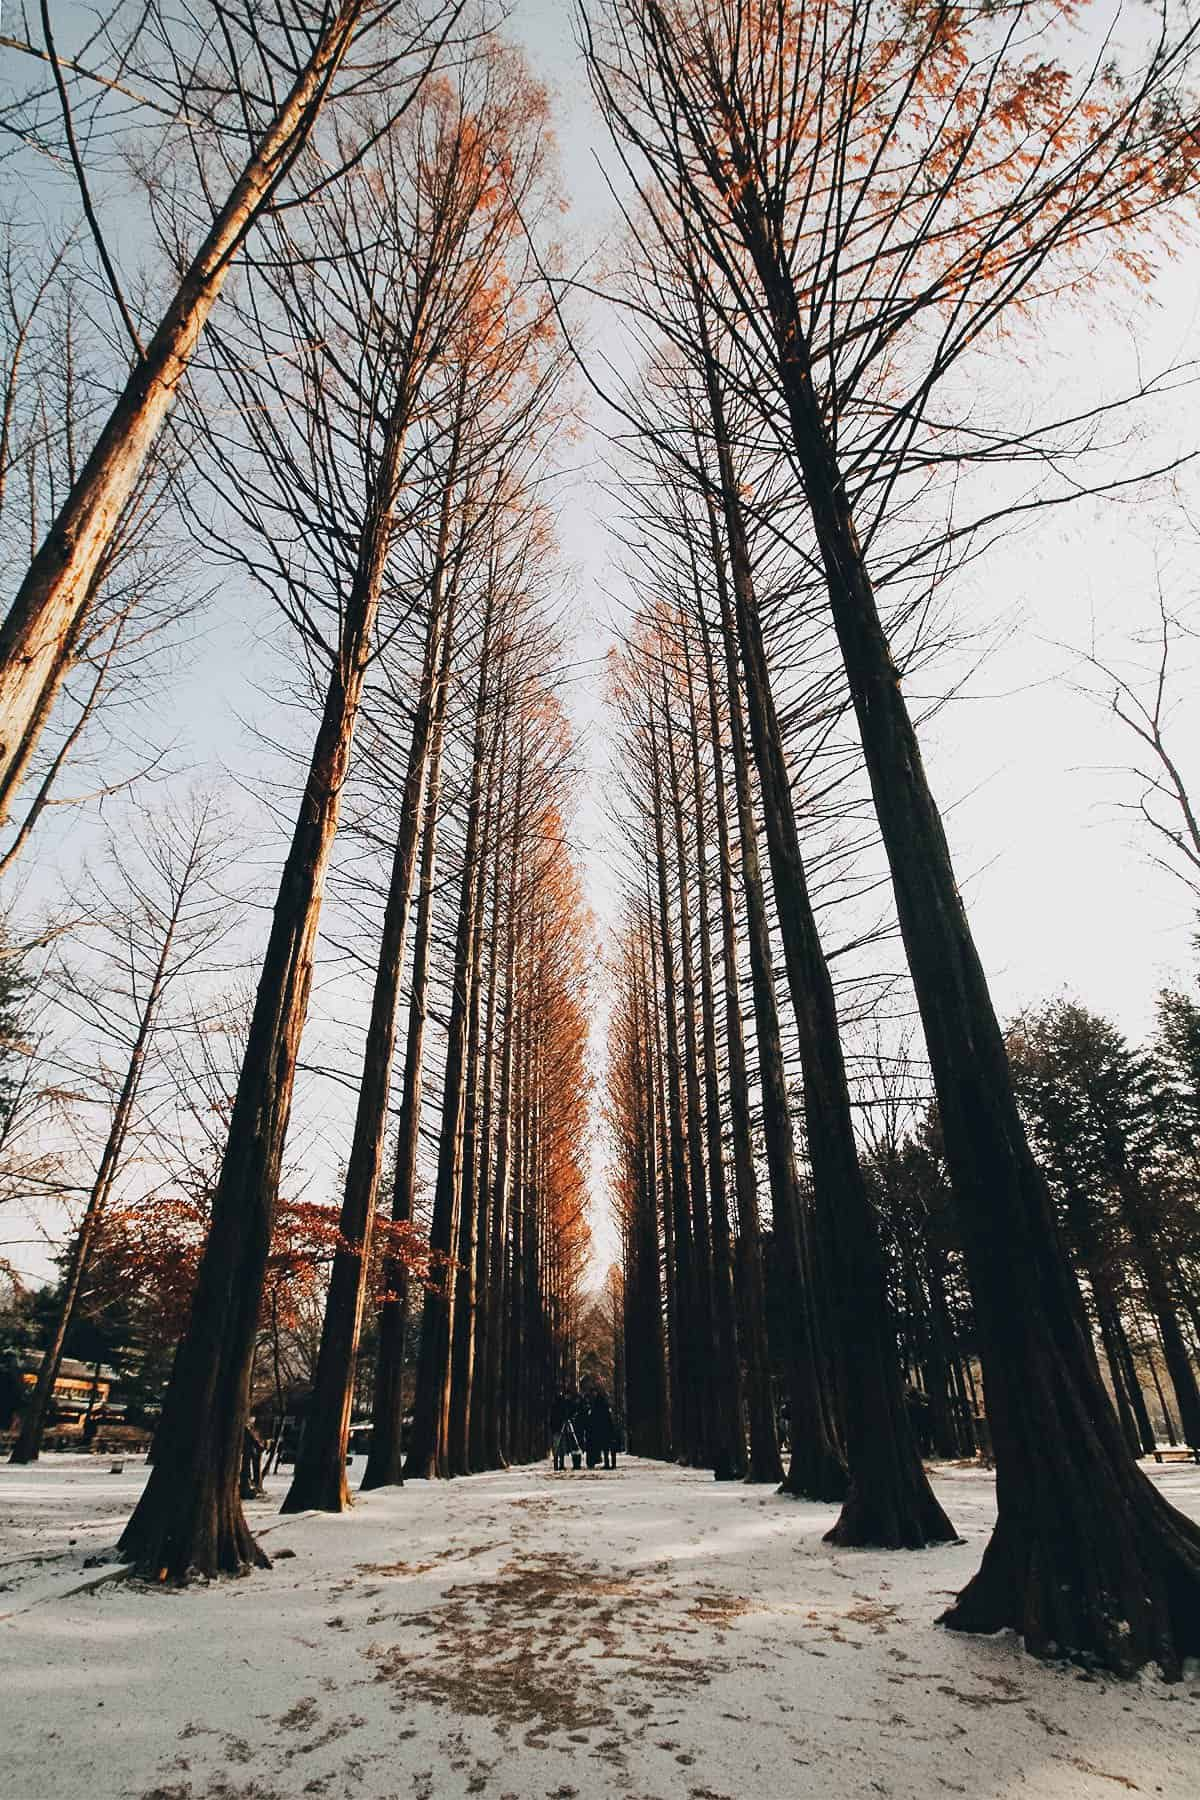 Nami Island Winter : island, winter, Visit, Island,, Gangchon, Park,, Petite, France, Seoul